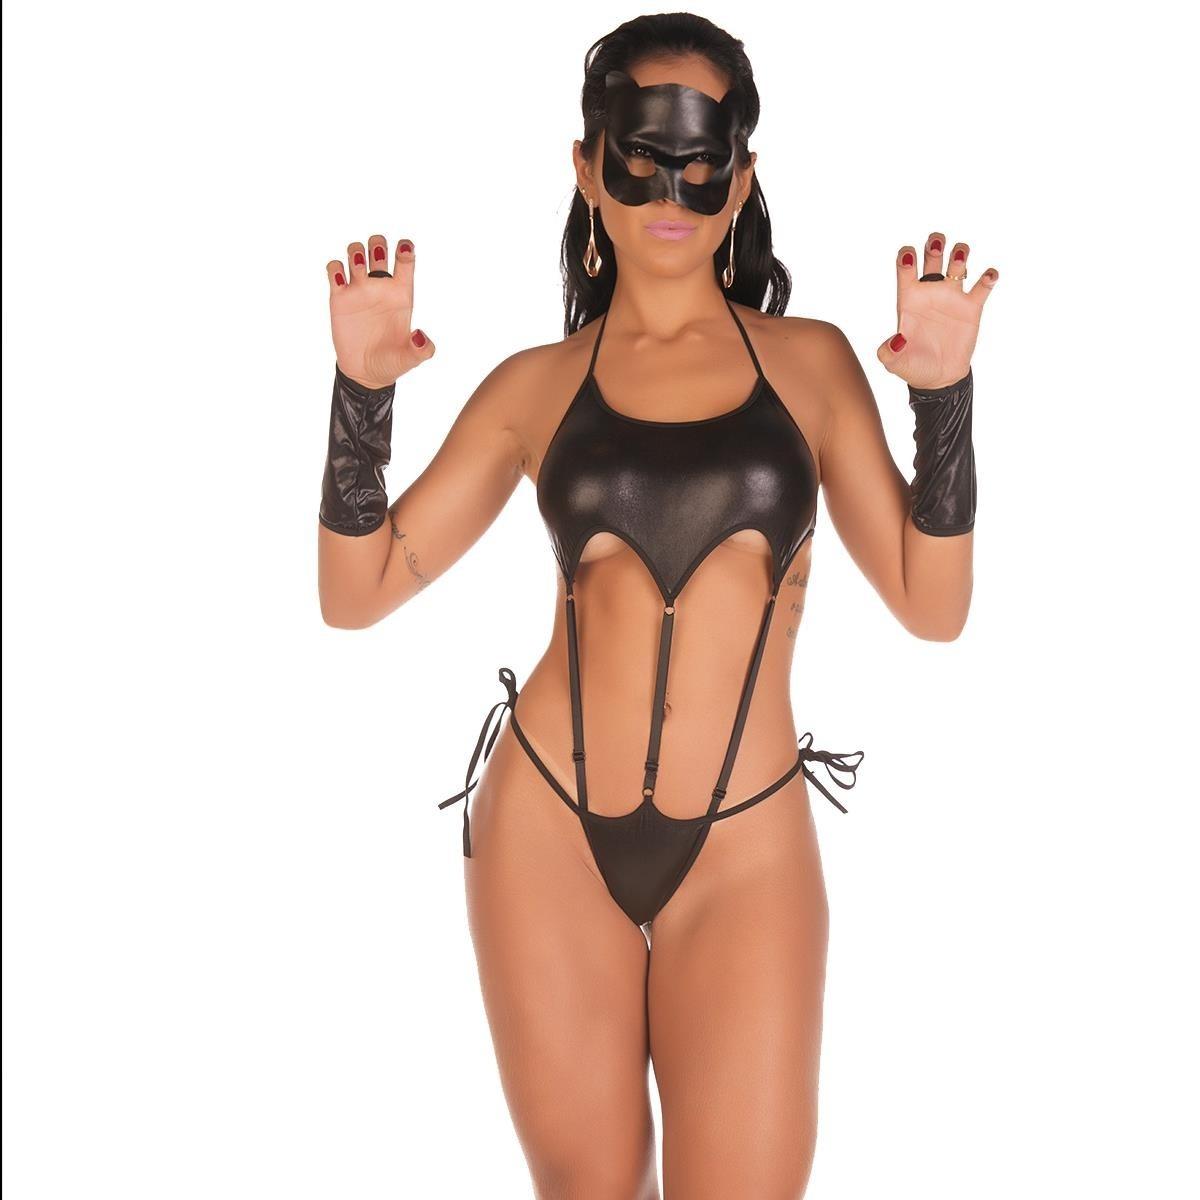 40196ad8c fantasia feminina sexy mulher gato lingerie body sensual. Carregando zoom.